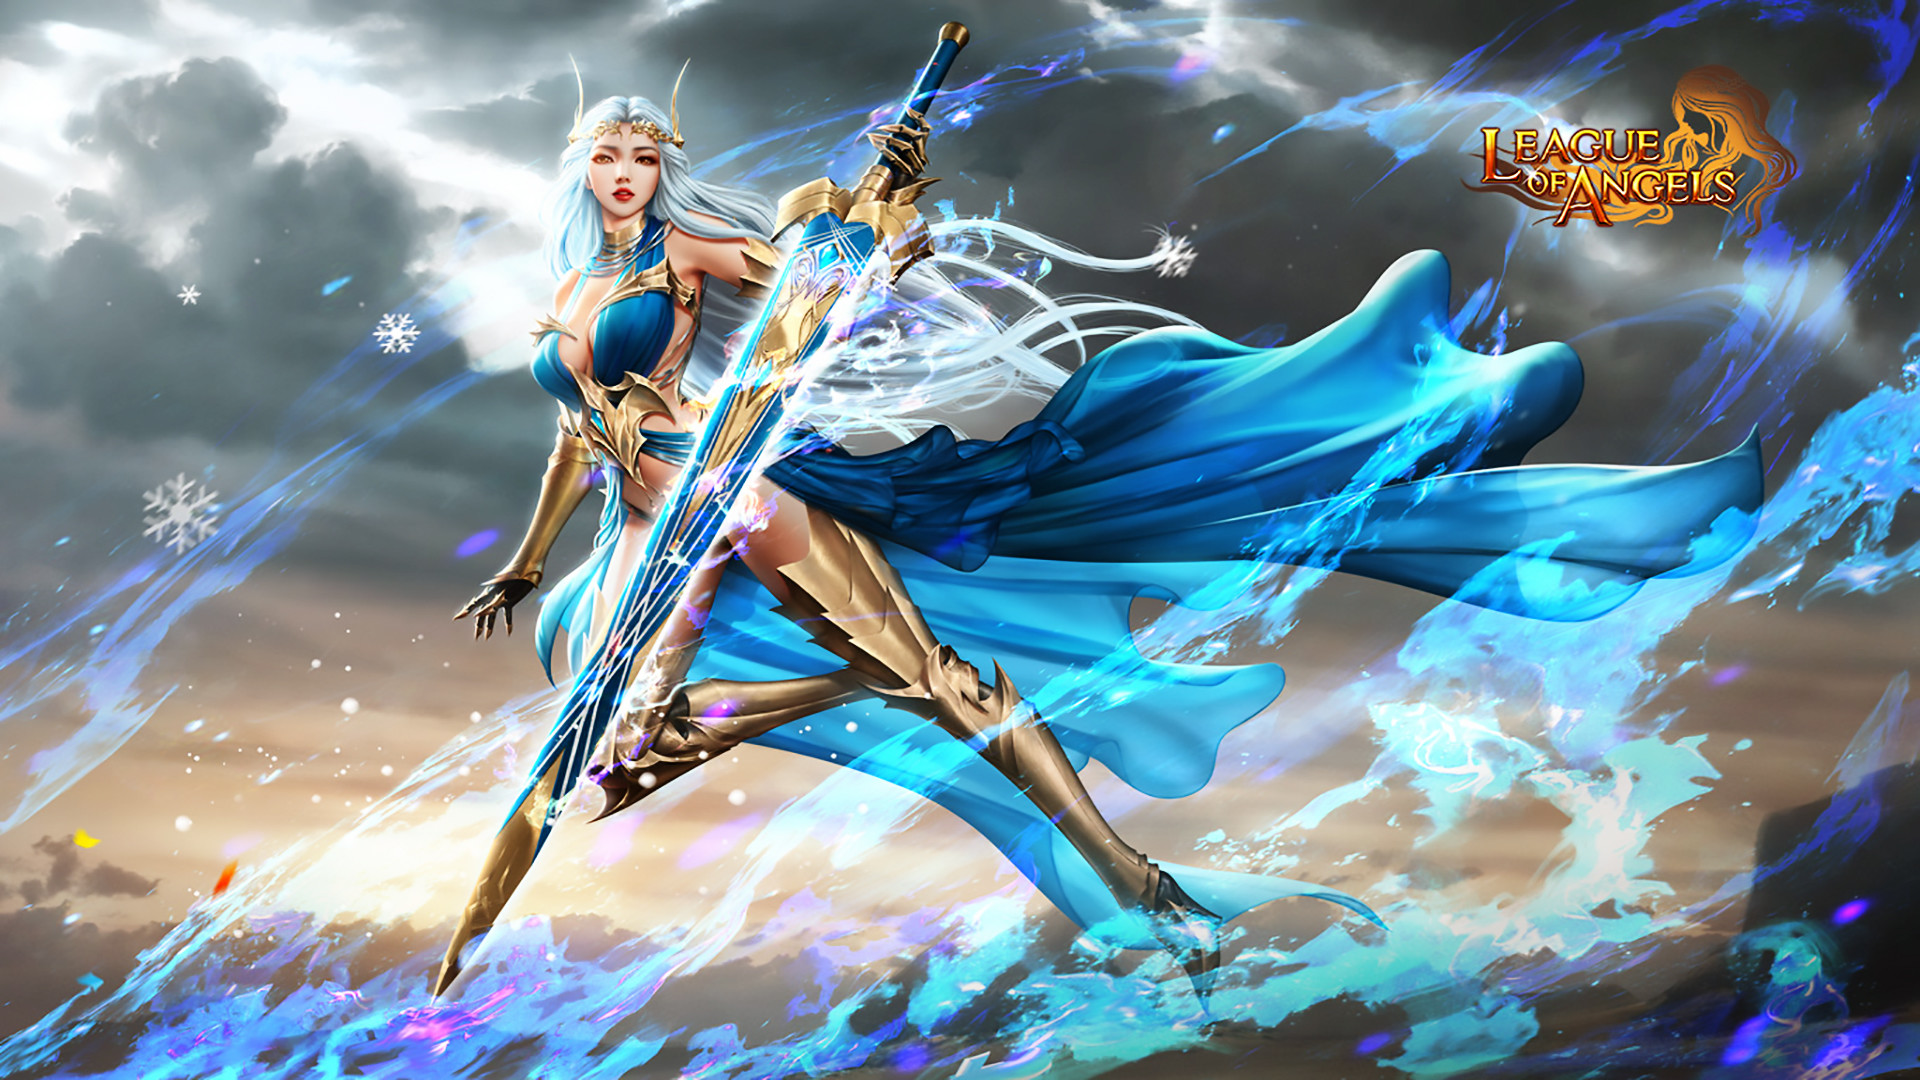 Angels Images Wallpaper 69 Images